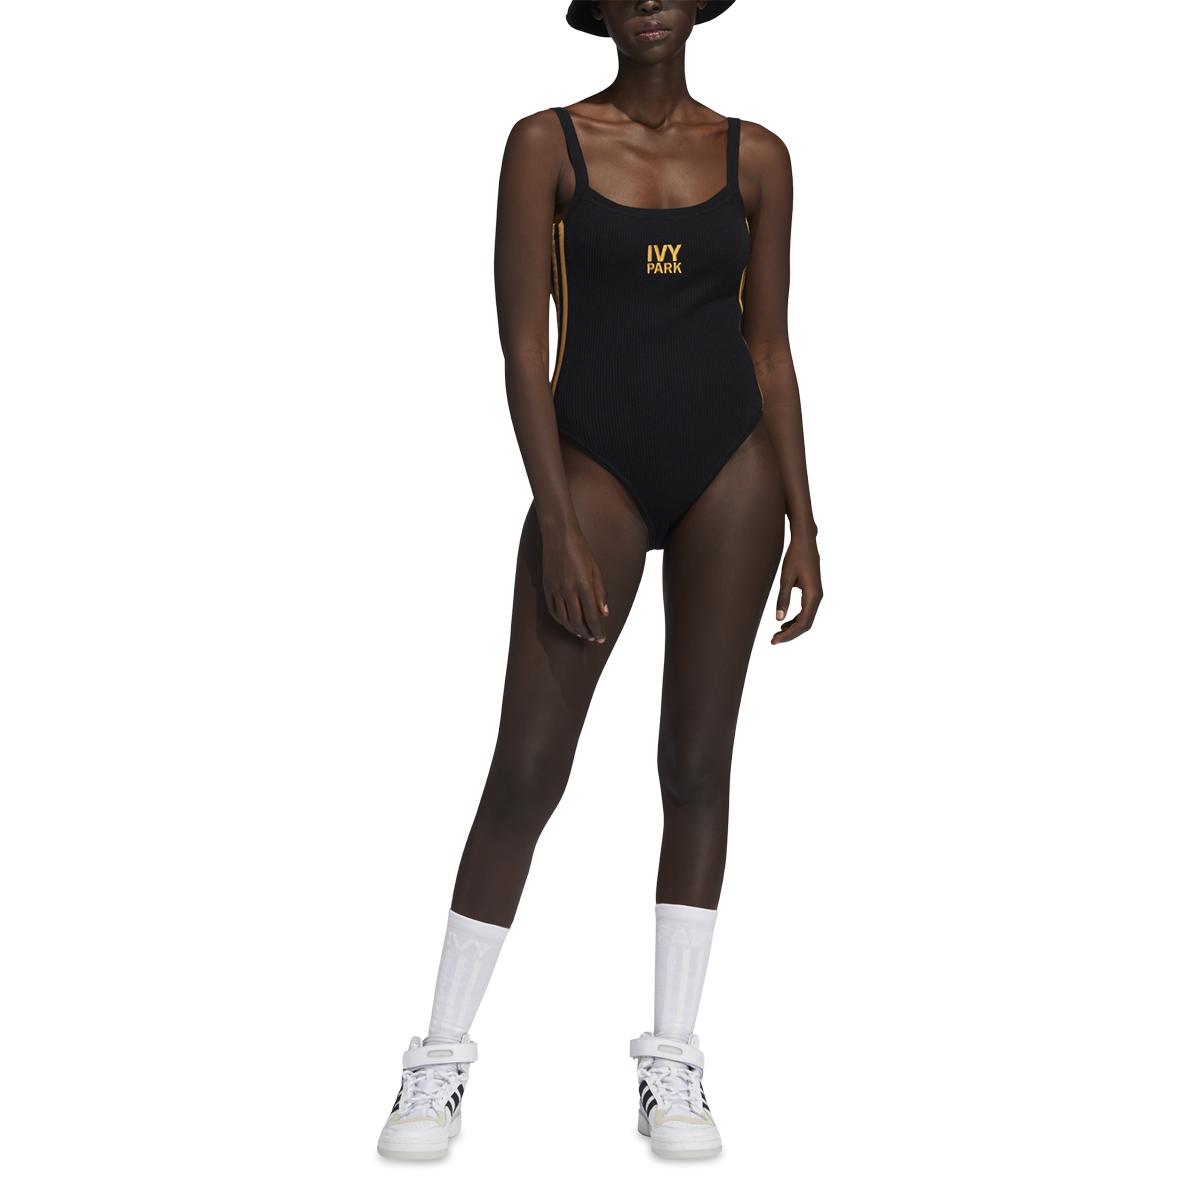 adidas IVY PARK Knit Bodysuit